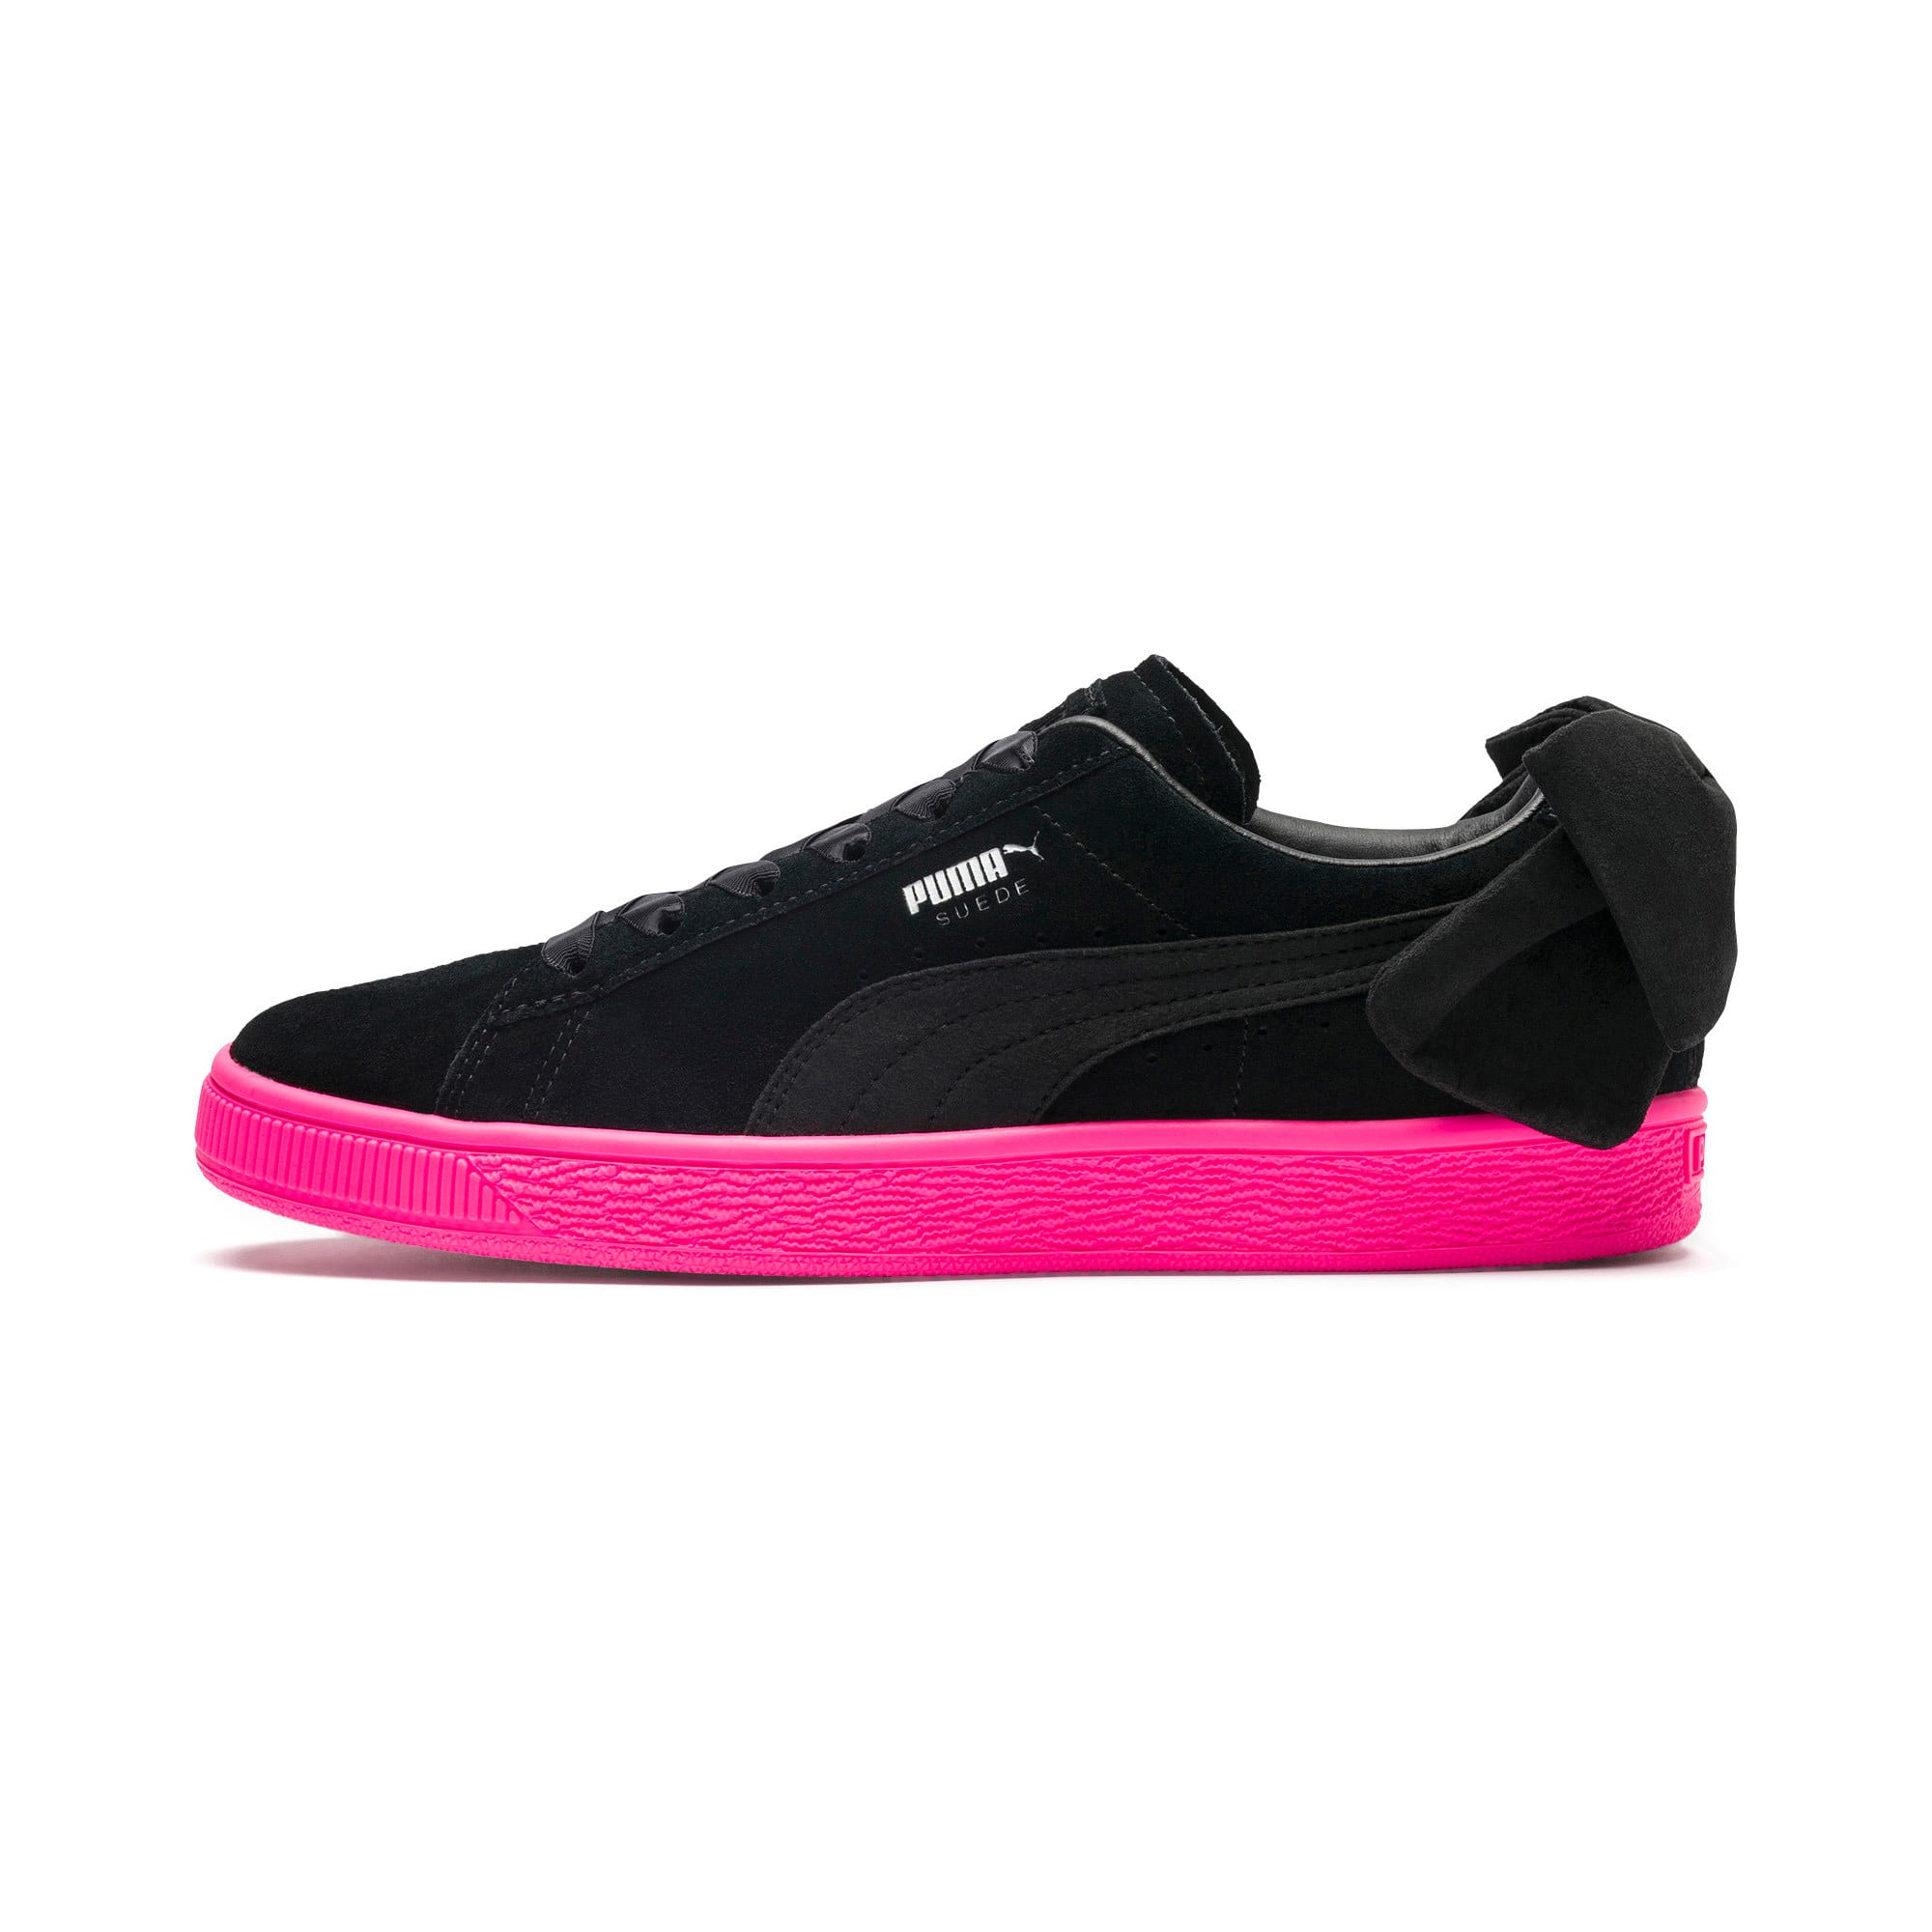 Thumbnail 1 of Suede Bow Block Women's Sneakers, Puma Black-Puma Black, medium